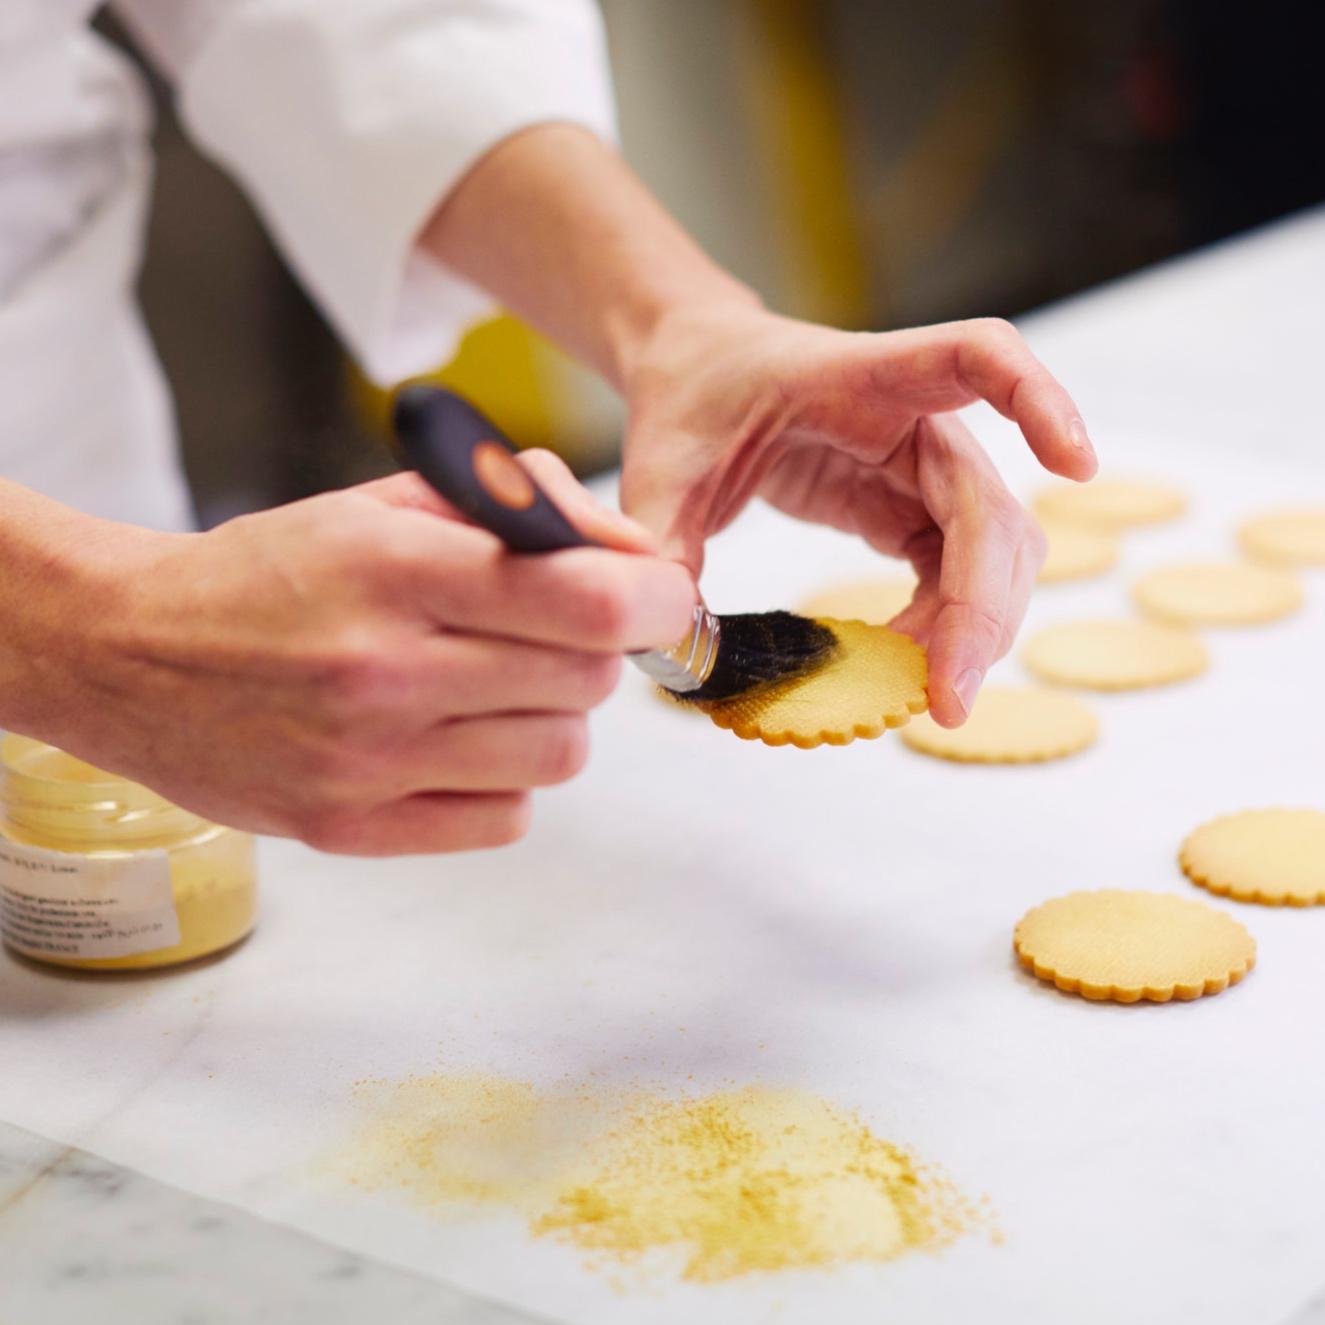 20180828-making-cakes457-b.jpg